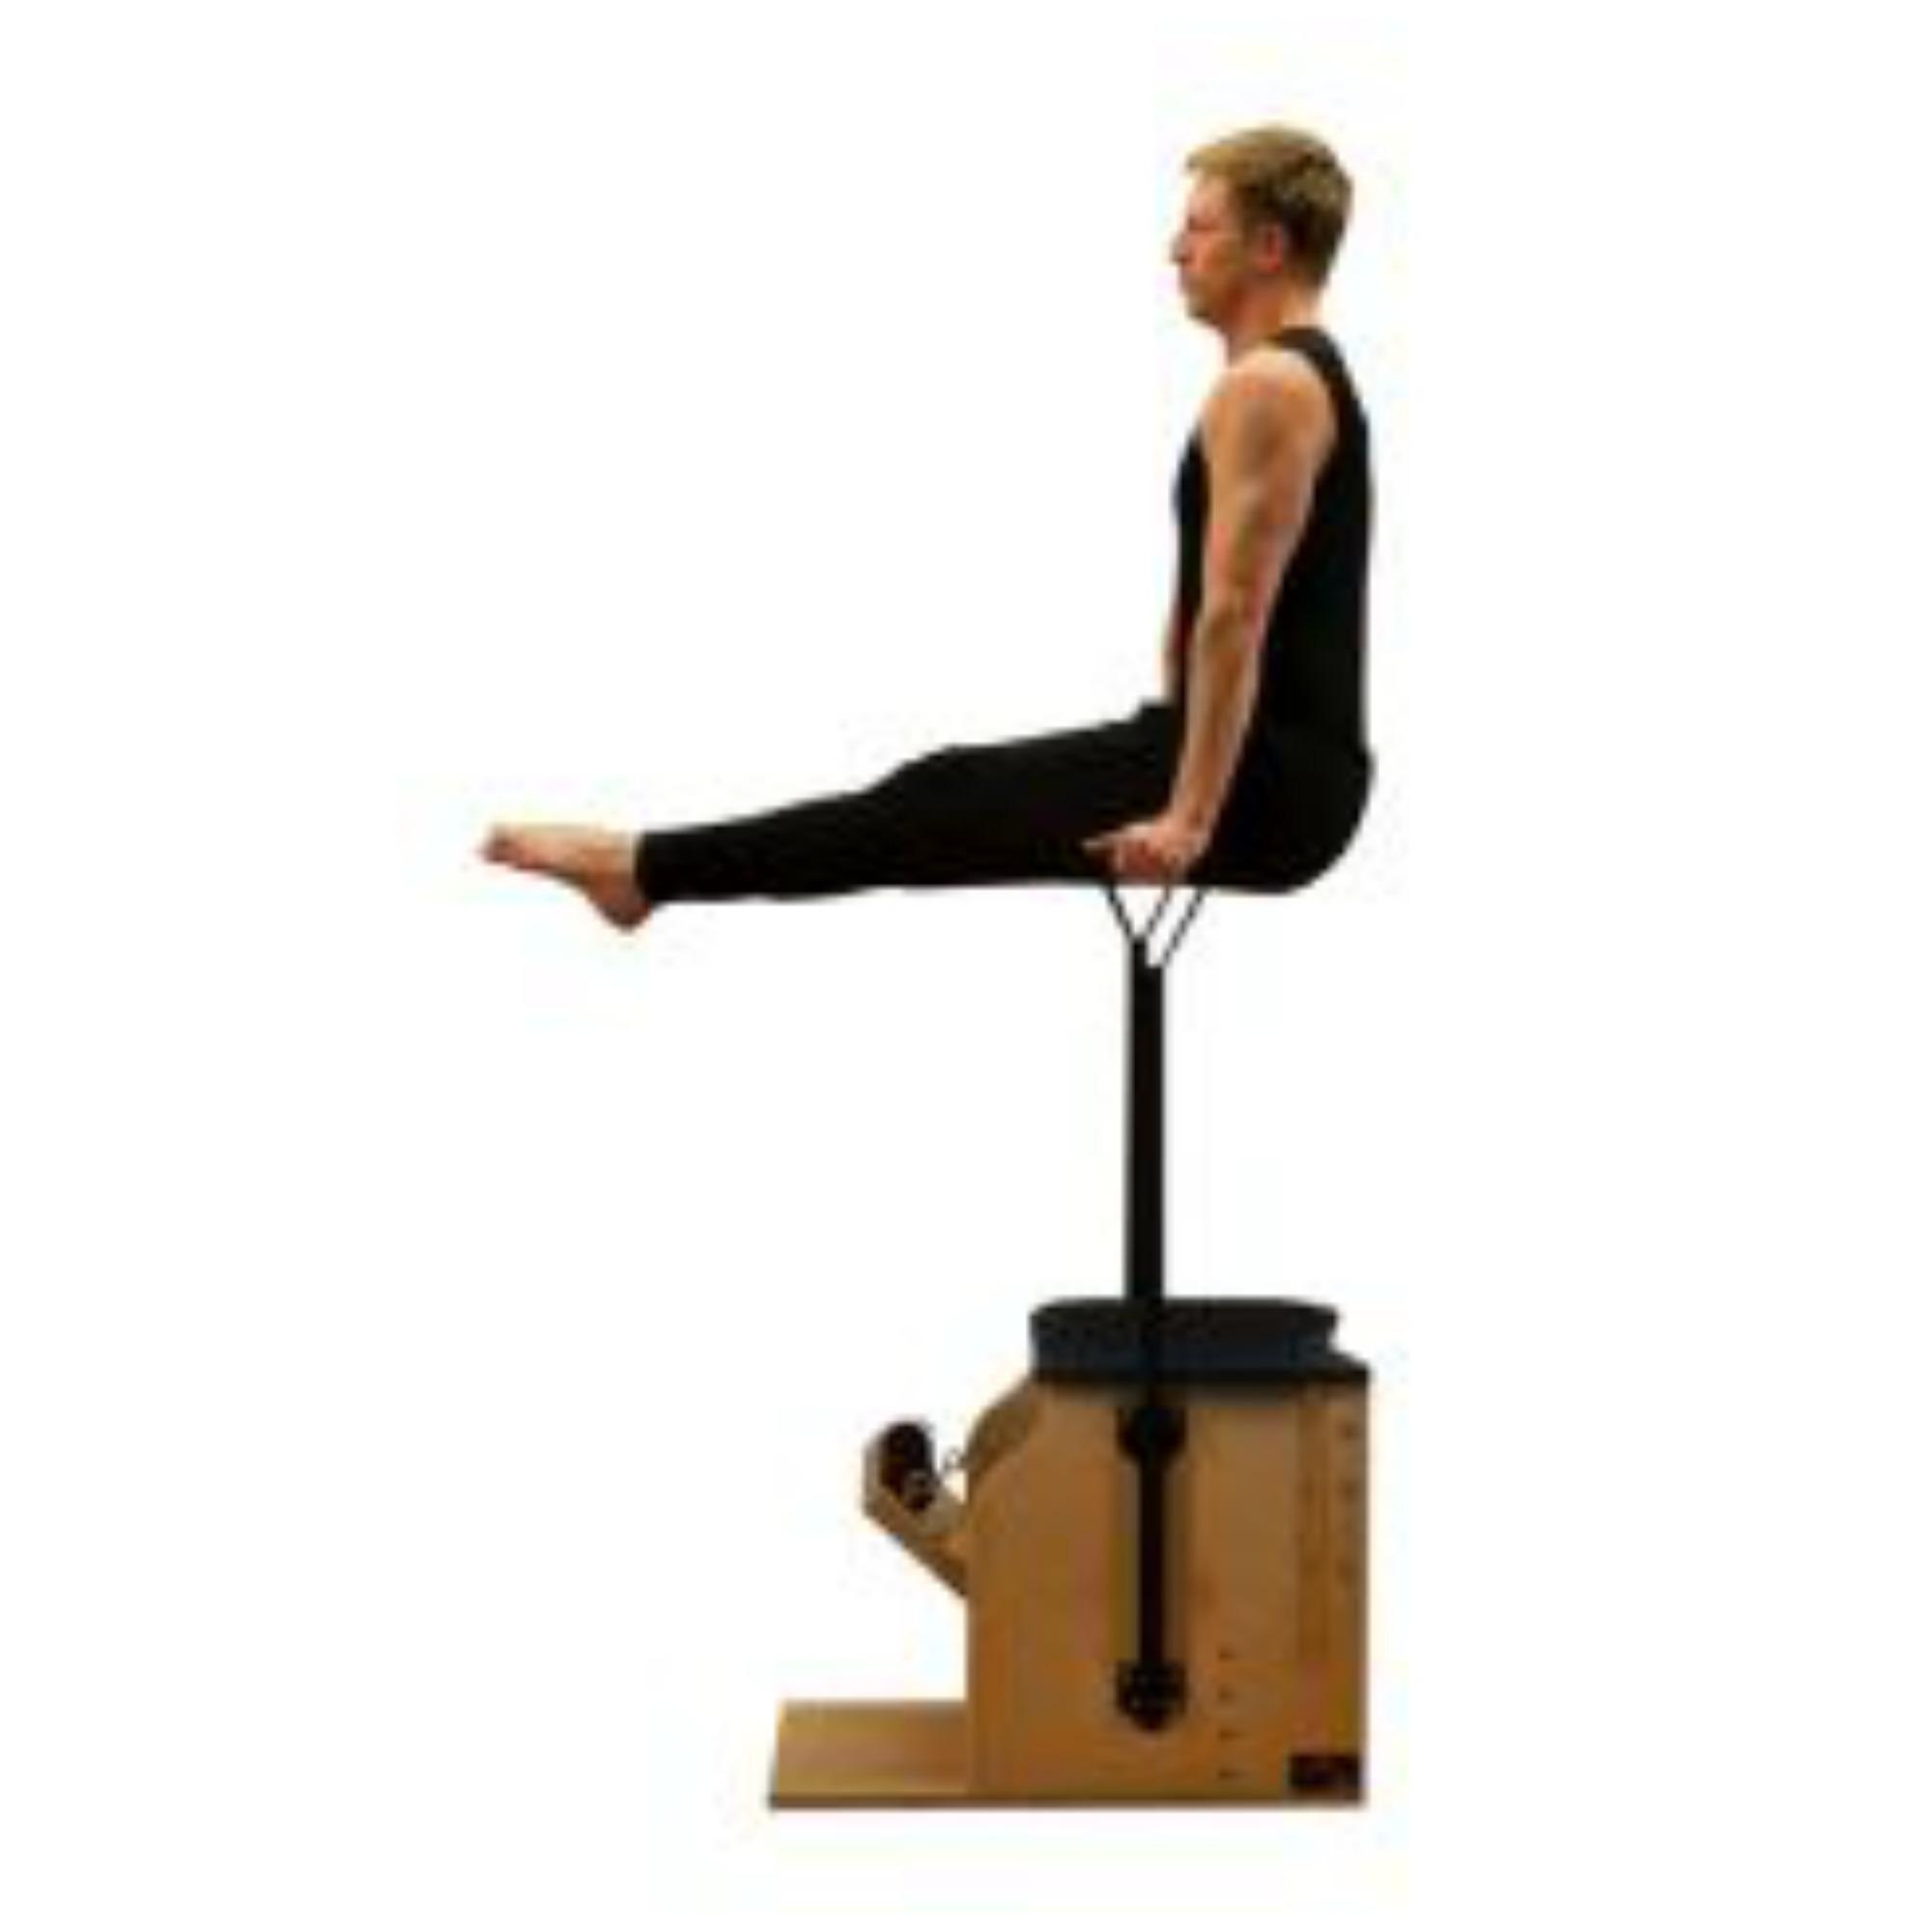 Pilates Combo Pilates Chair Pre Built: High/Low Combo Chair Pilates Cihazı